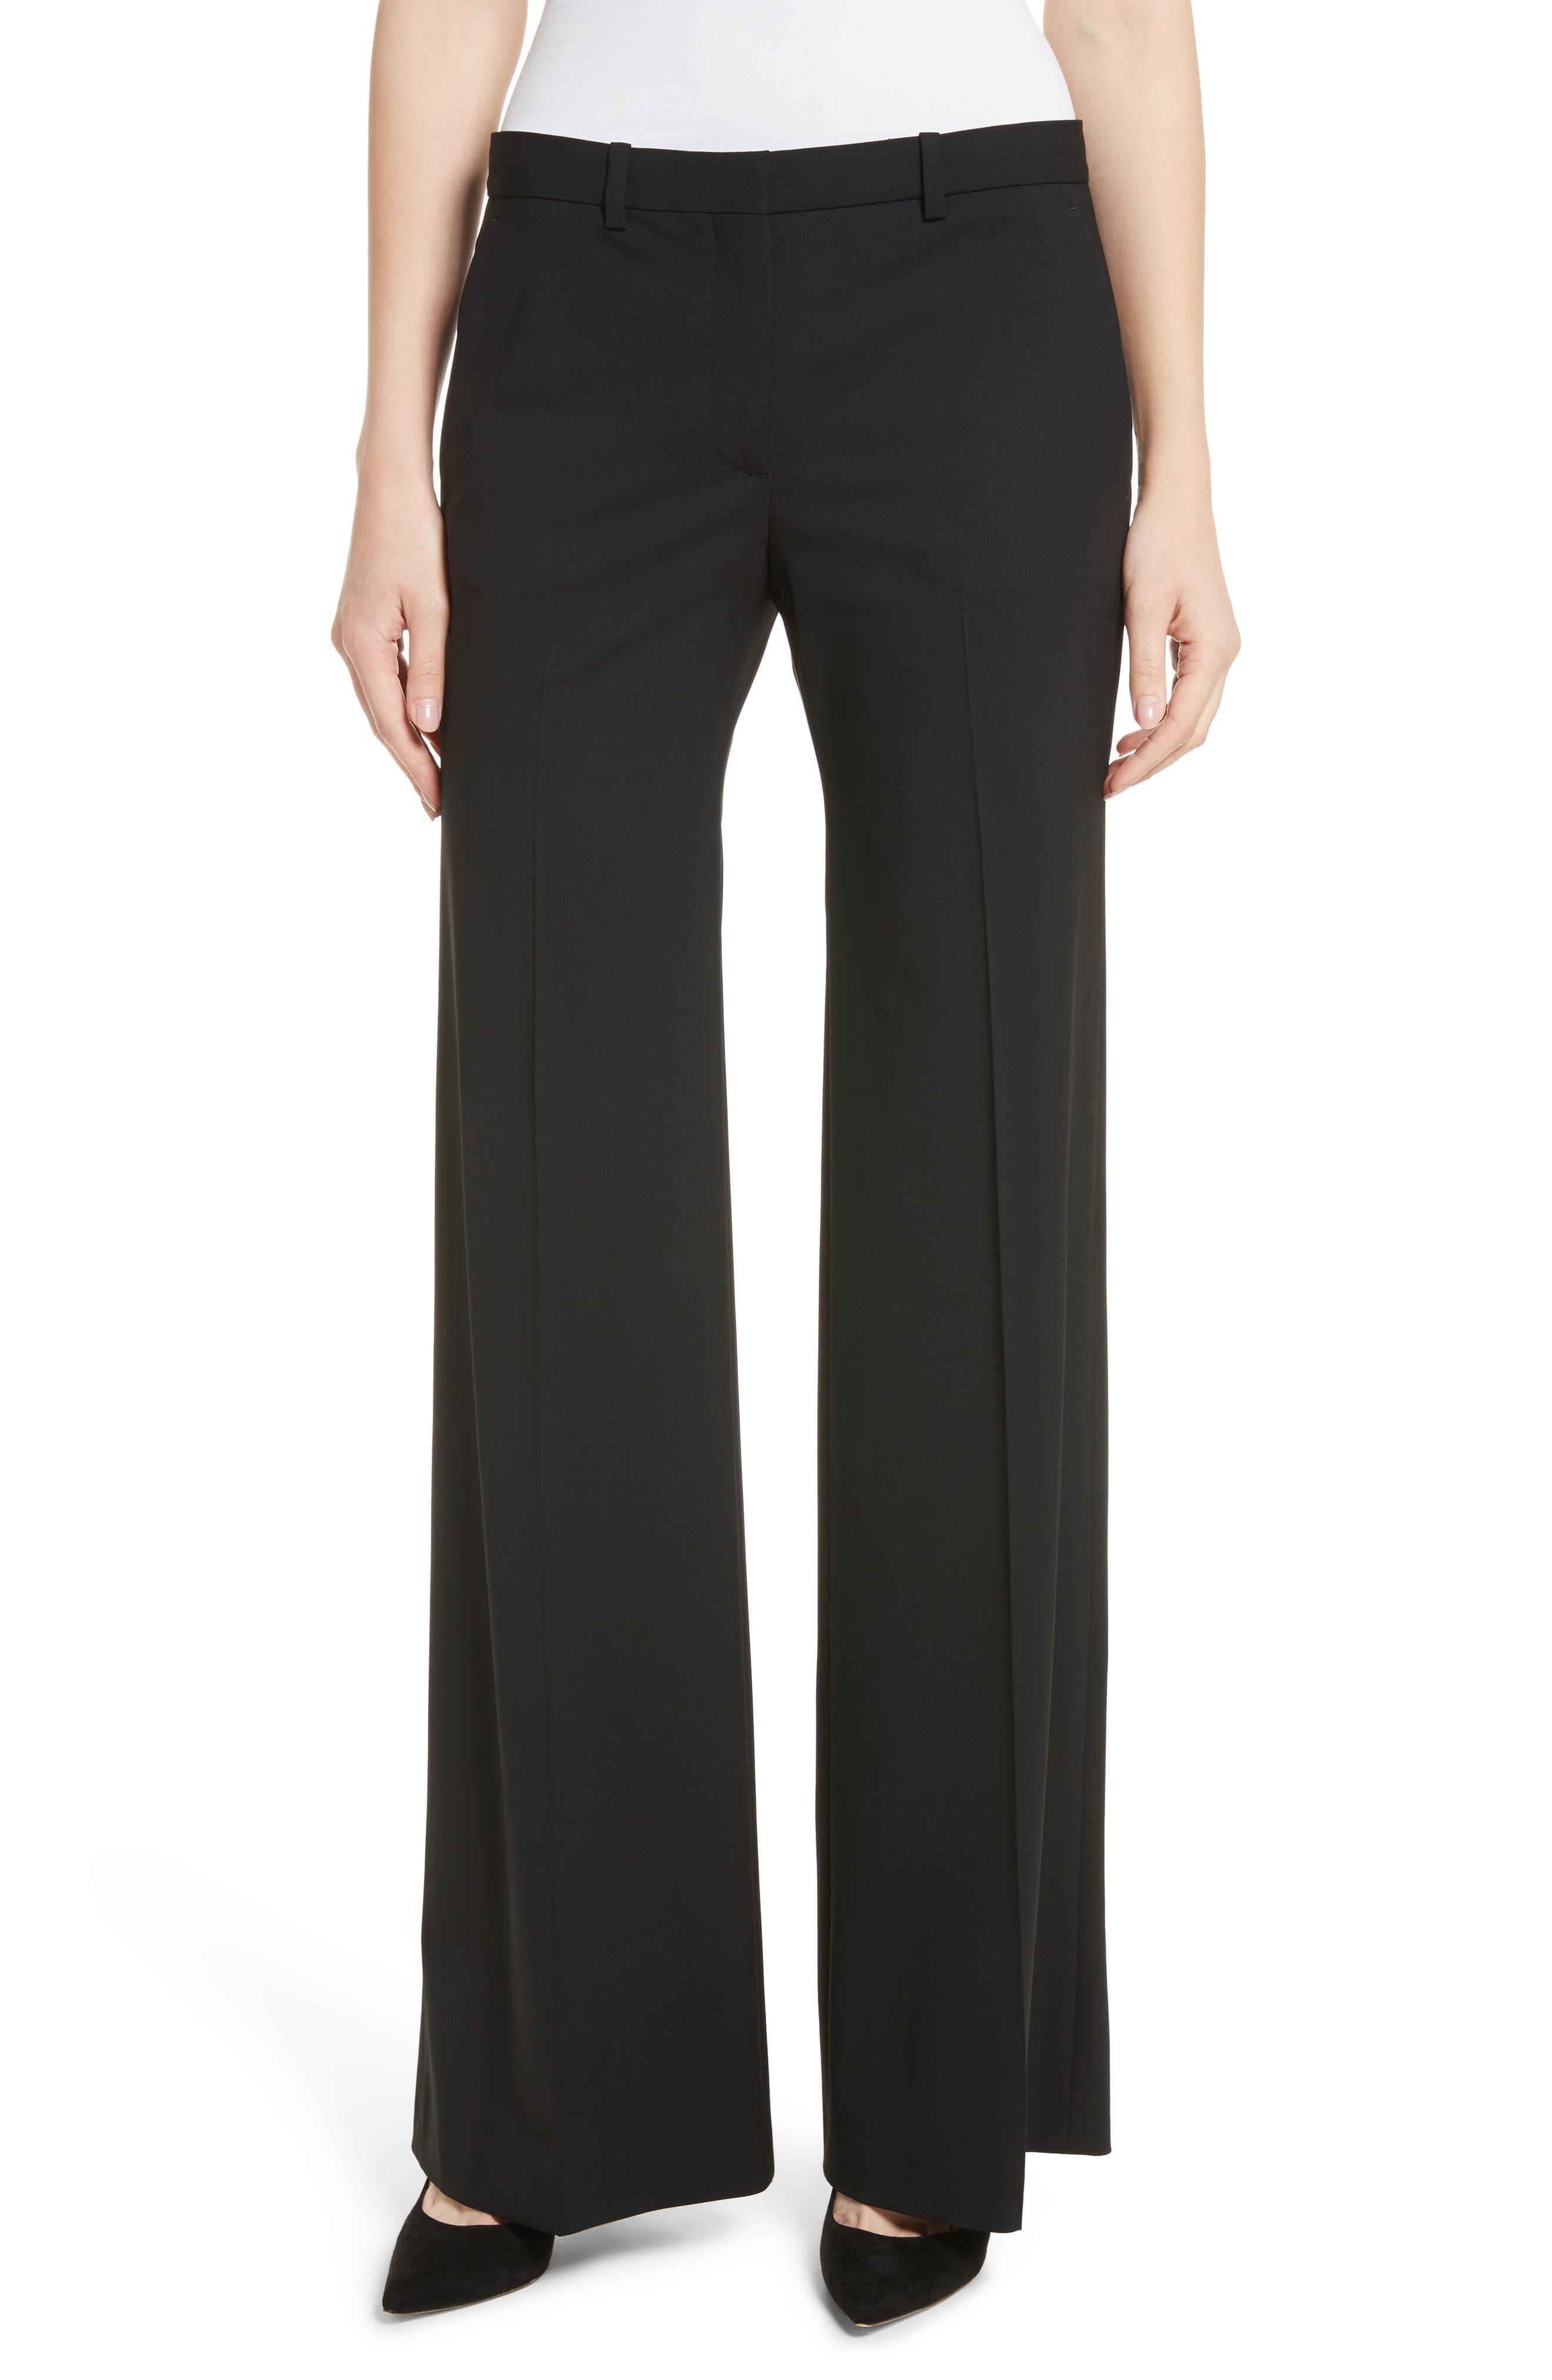 Demetria 2 Flare Leg Good Wool Suit Pants,                             Main thumbnail 1, color,                             BLACK